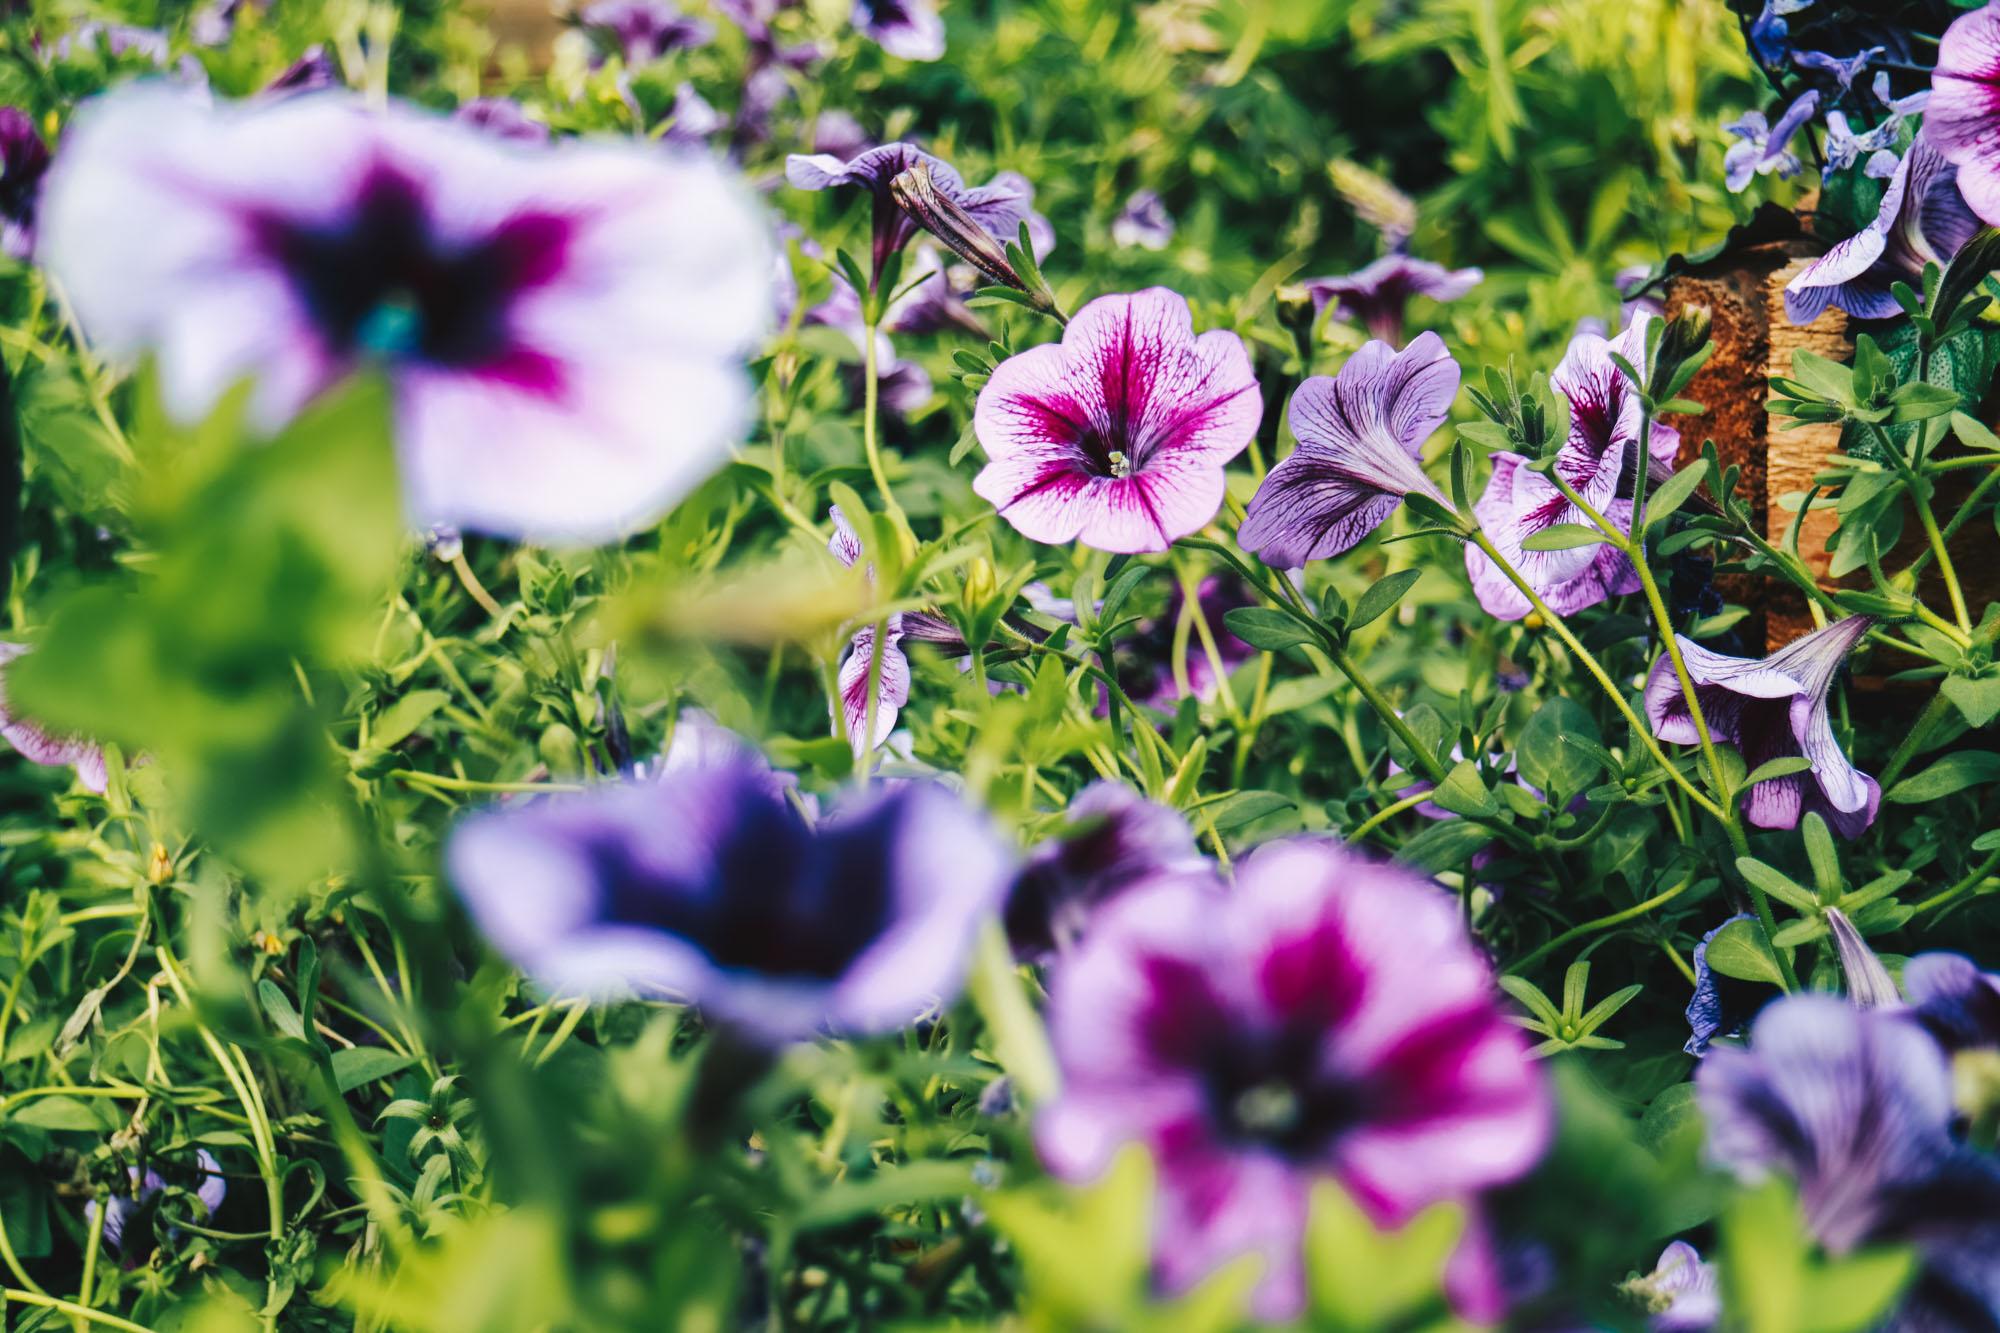 Blue-beauties-floral-display-gardensbythebay-darrenbloggie13